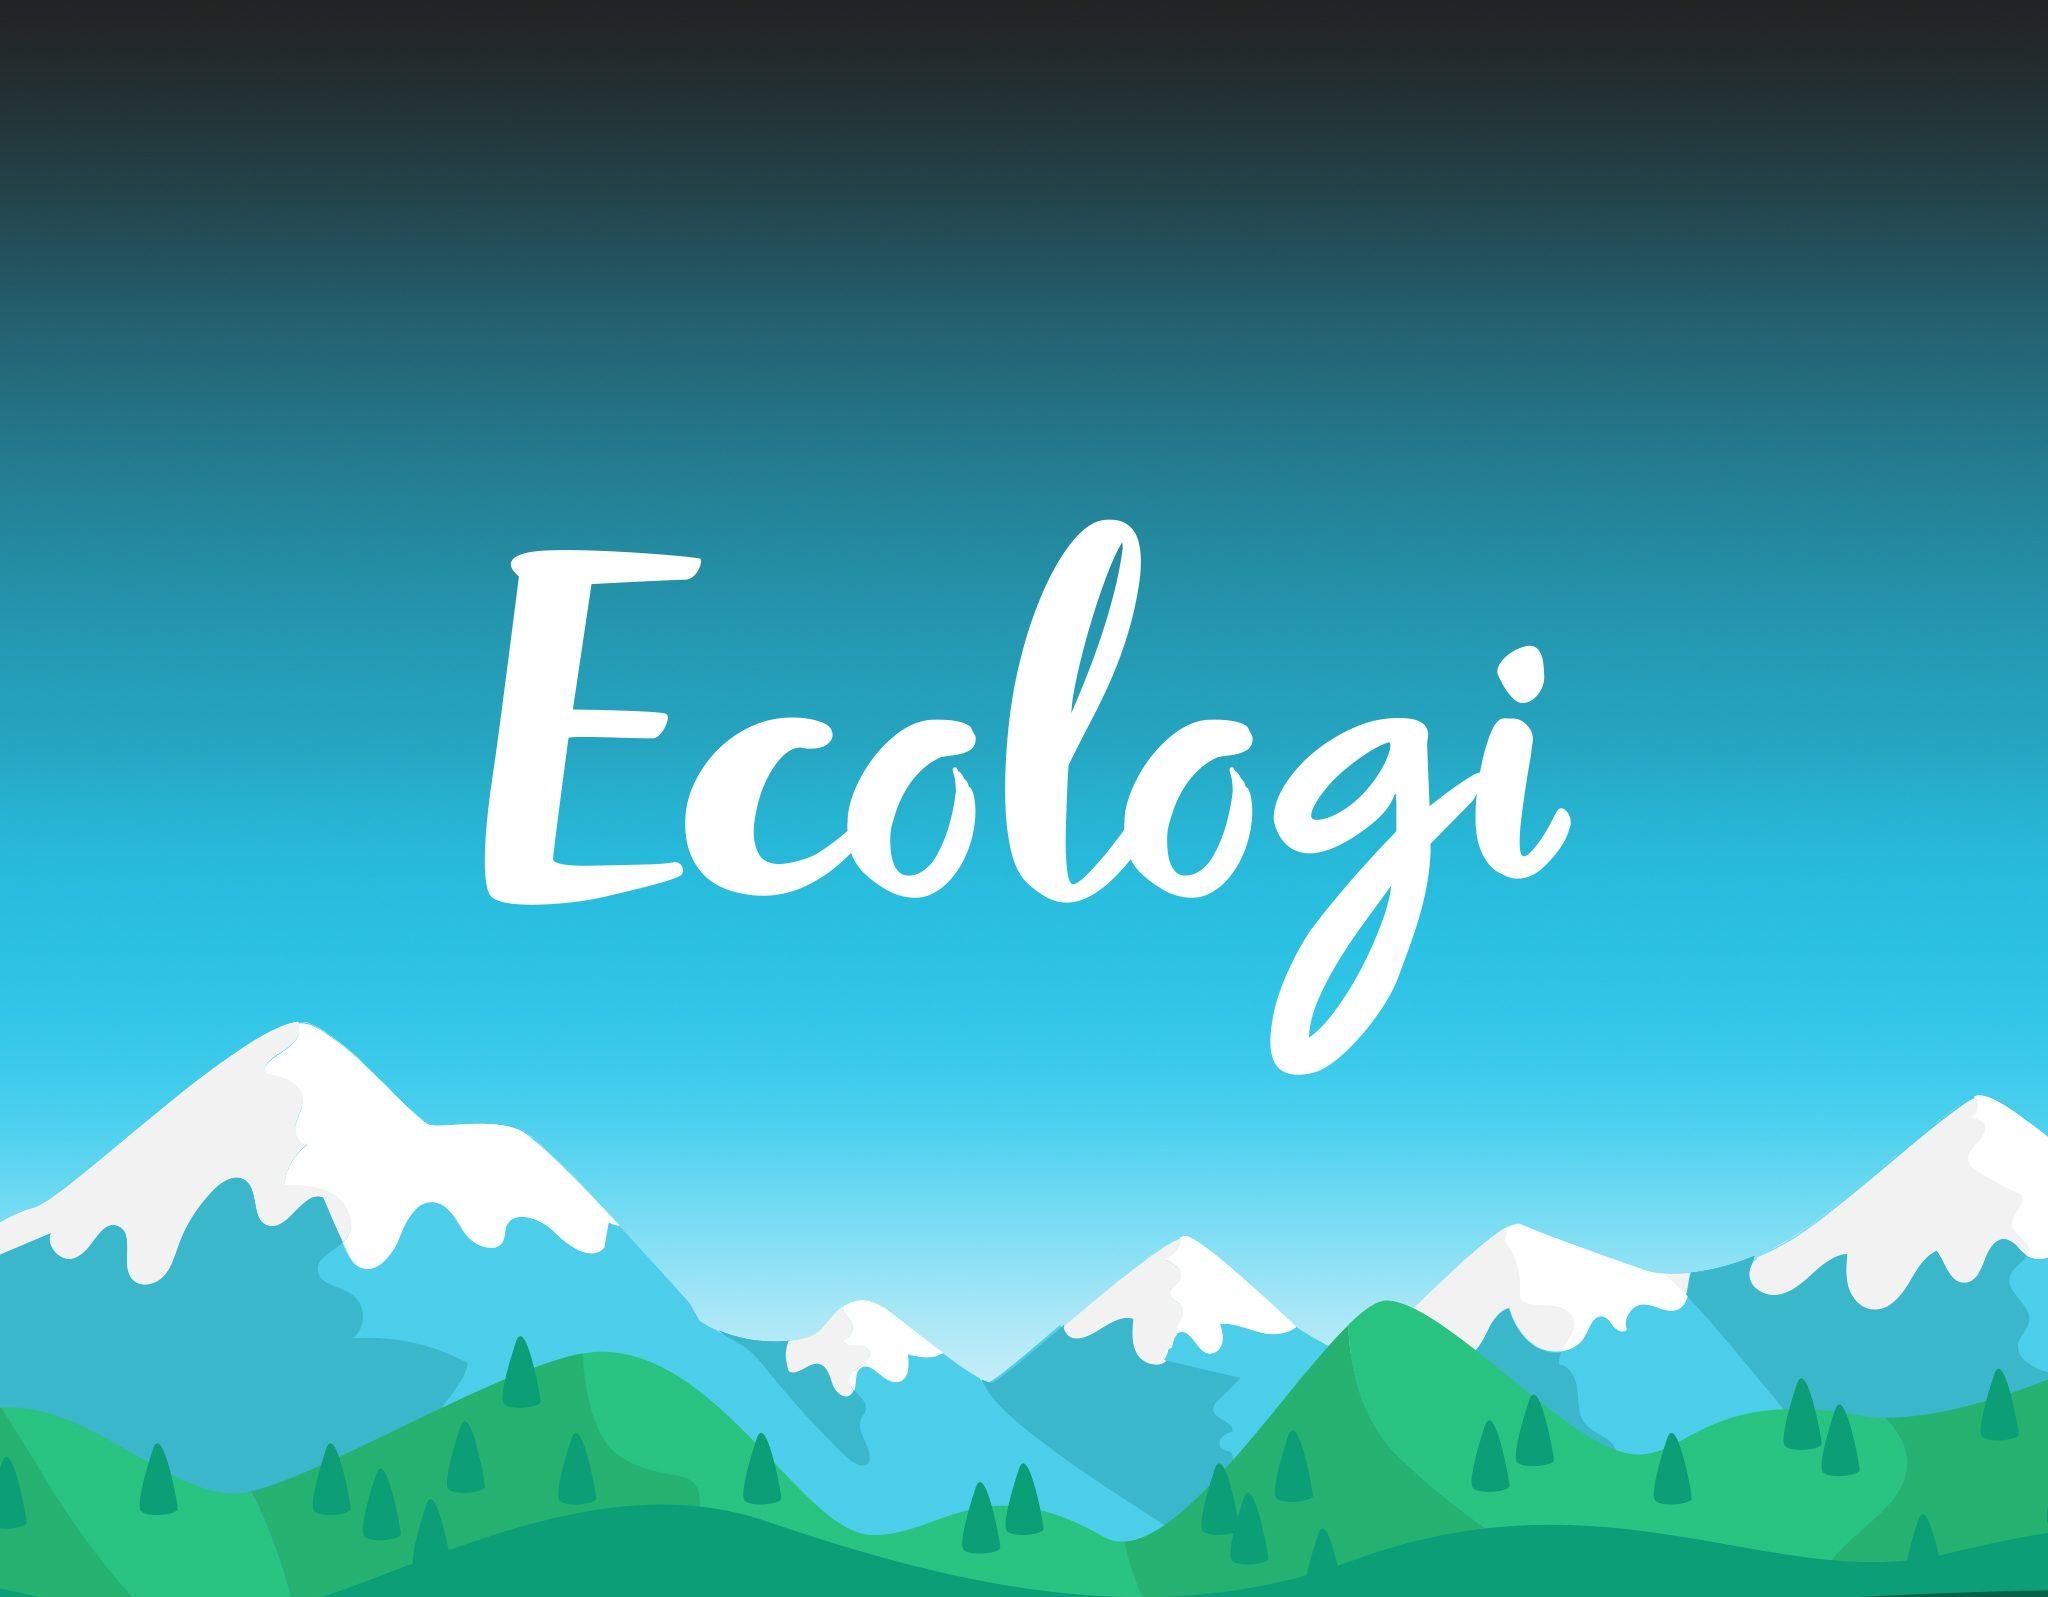 Torin-Sifan joins Ecologi